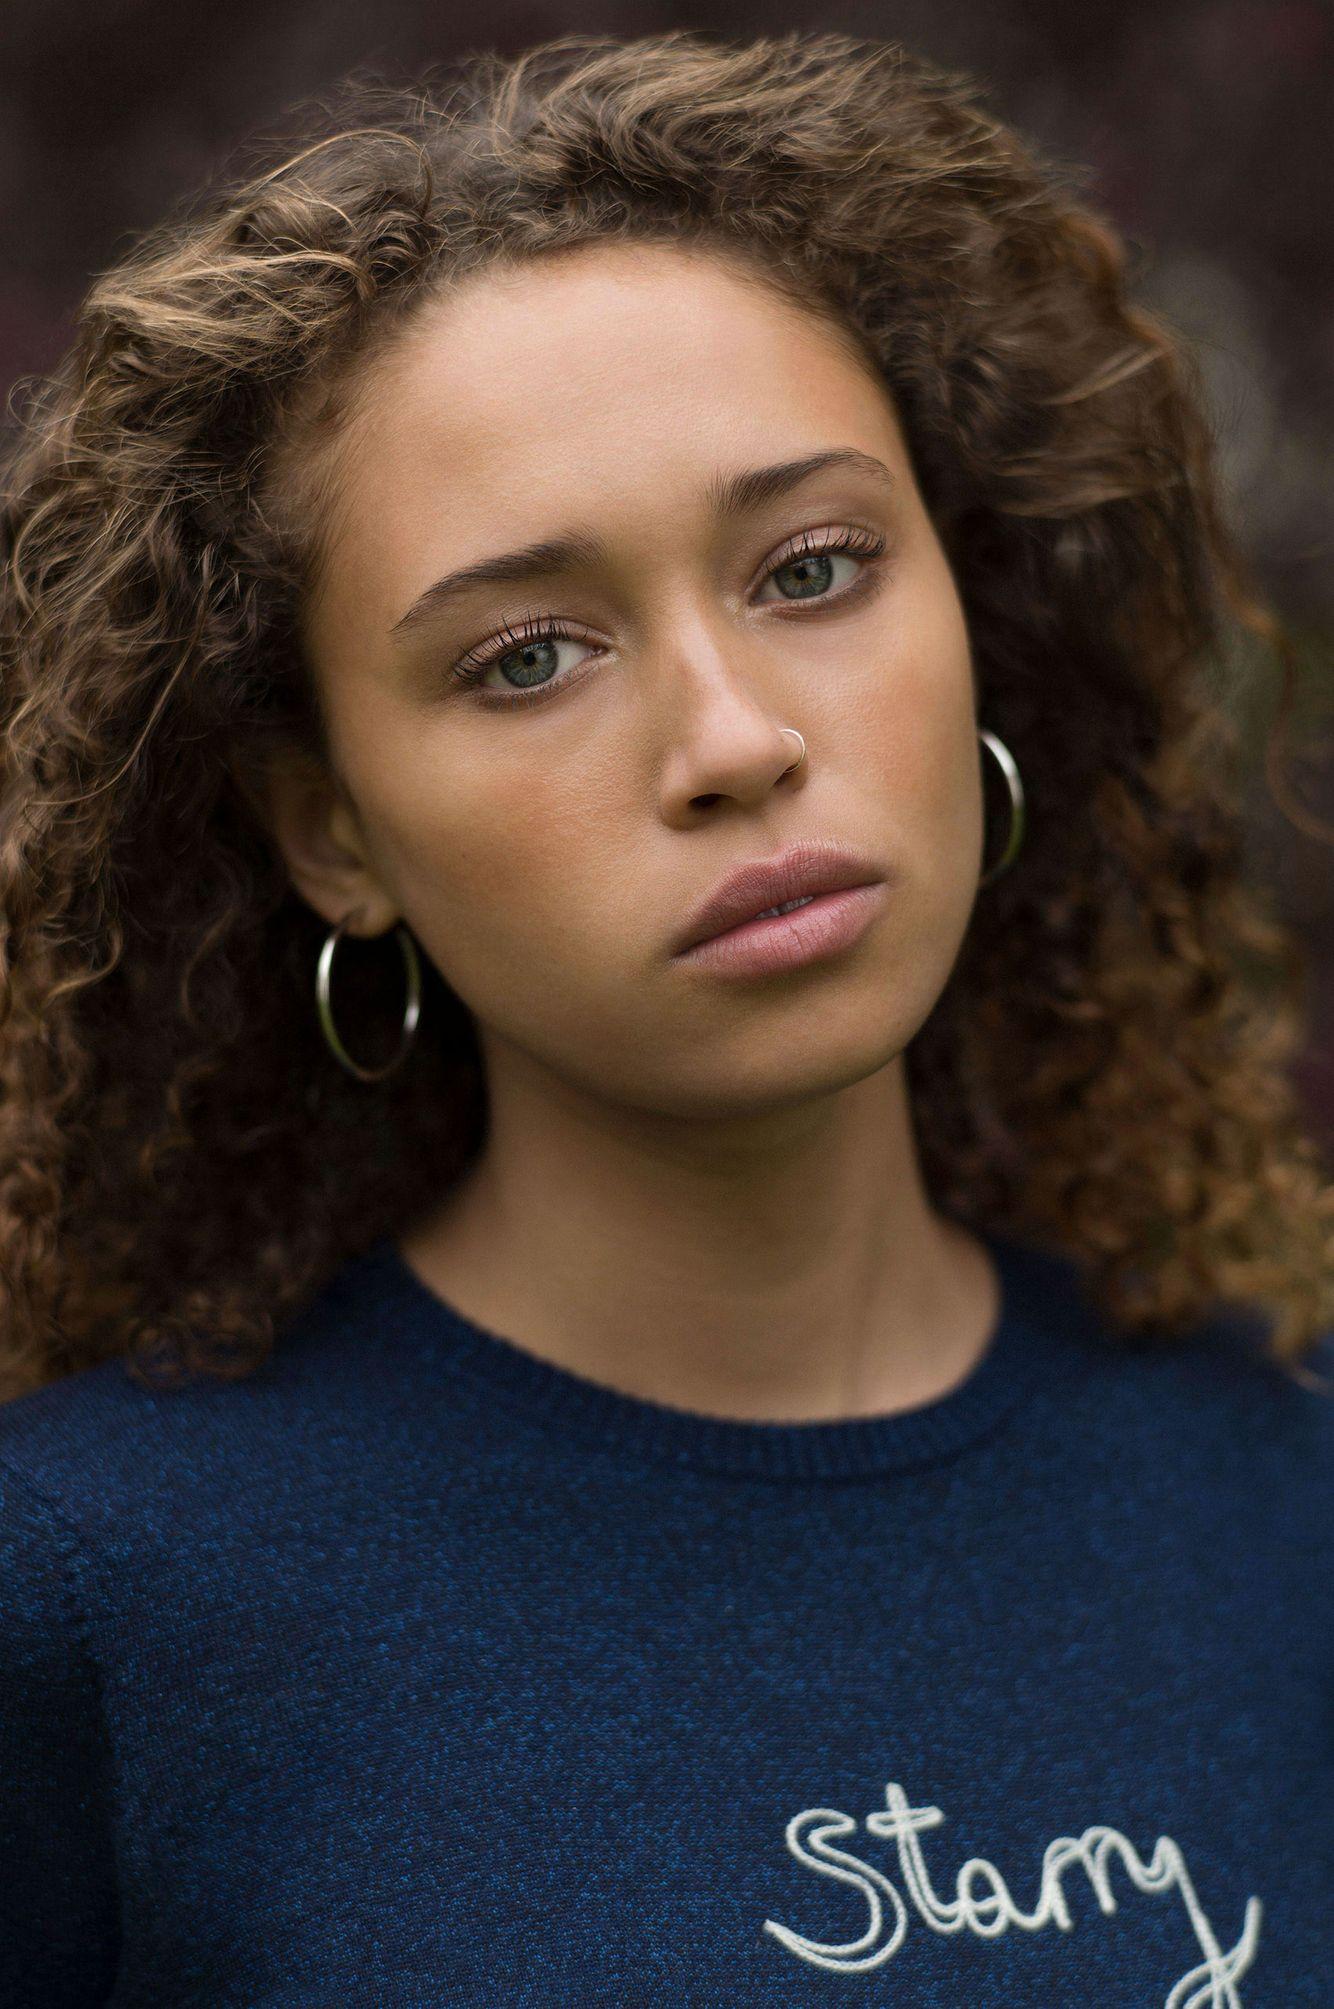 Actress Ella-Rae Smith